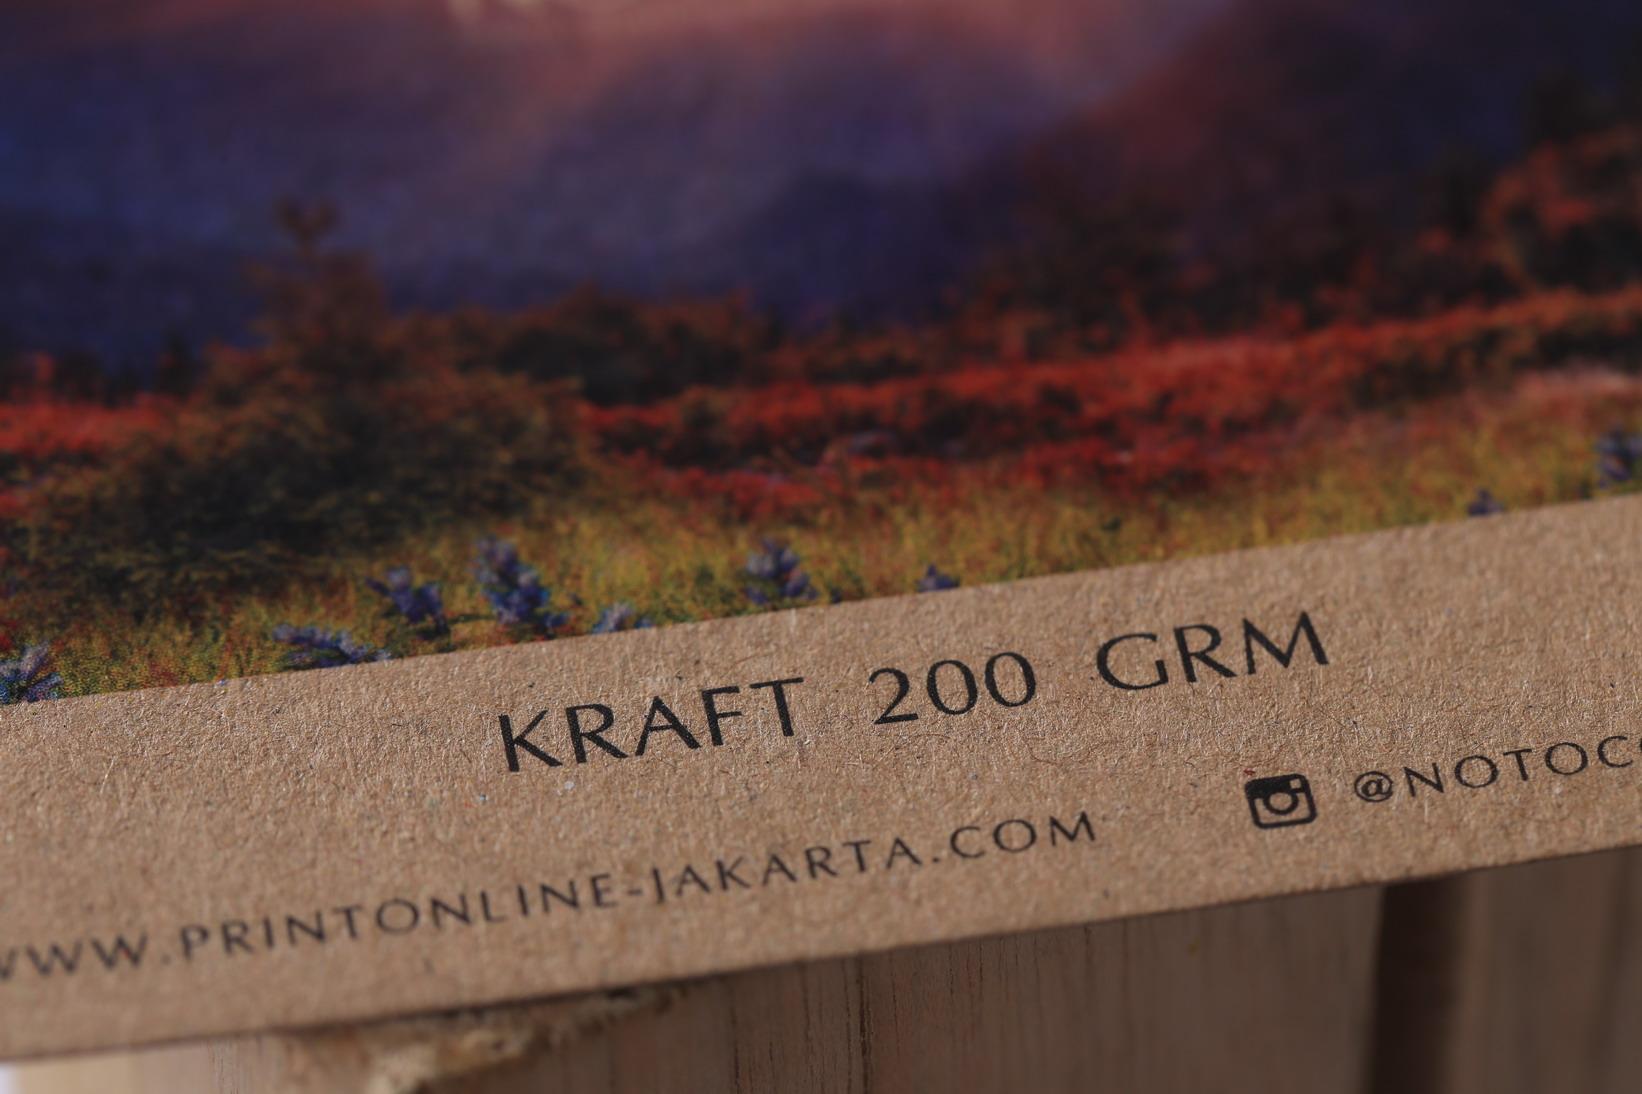 Kraft 200 grm